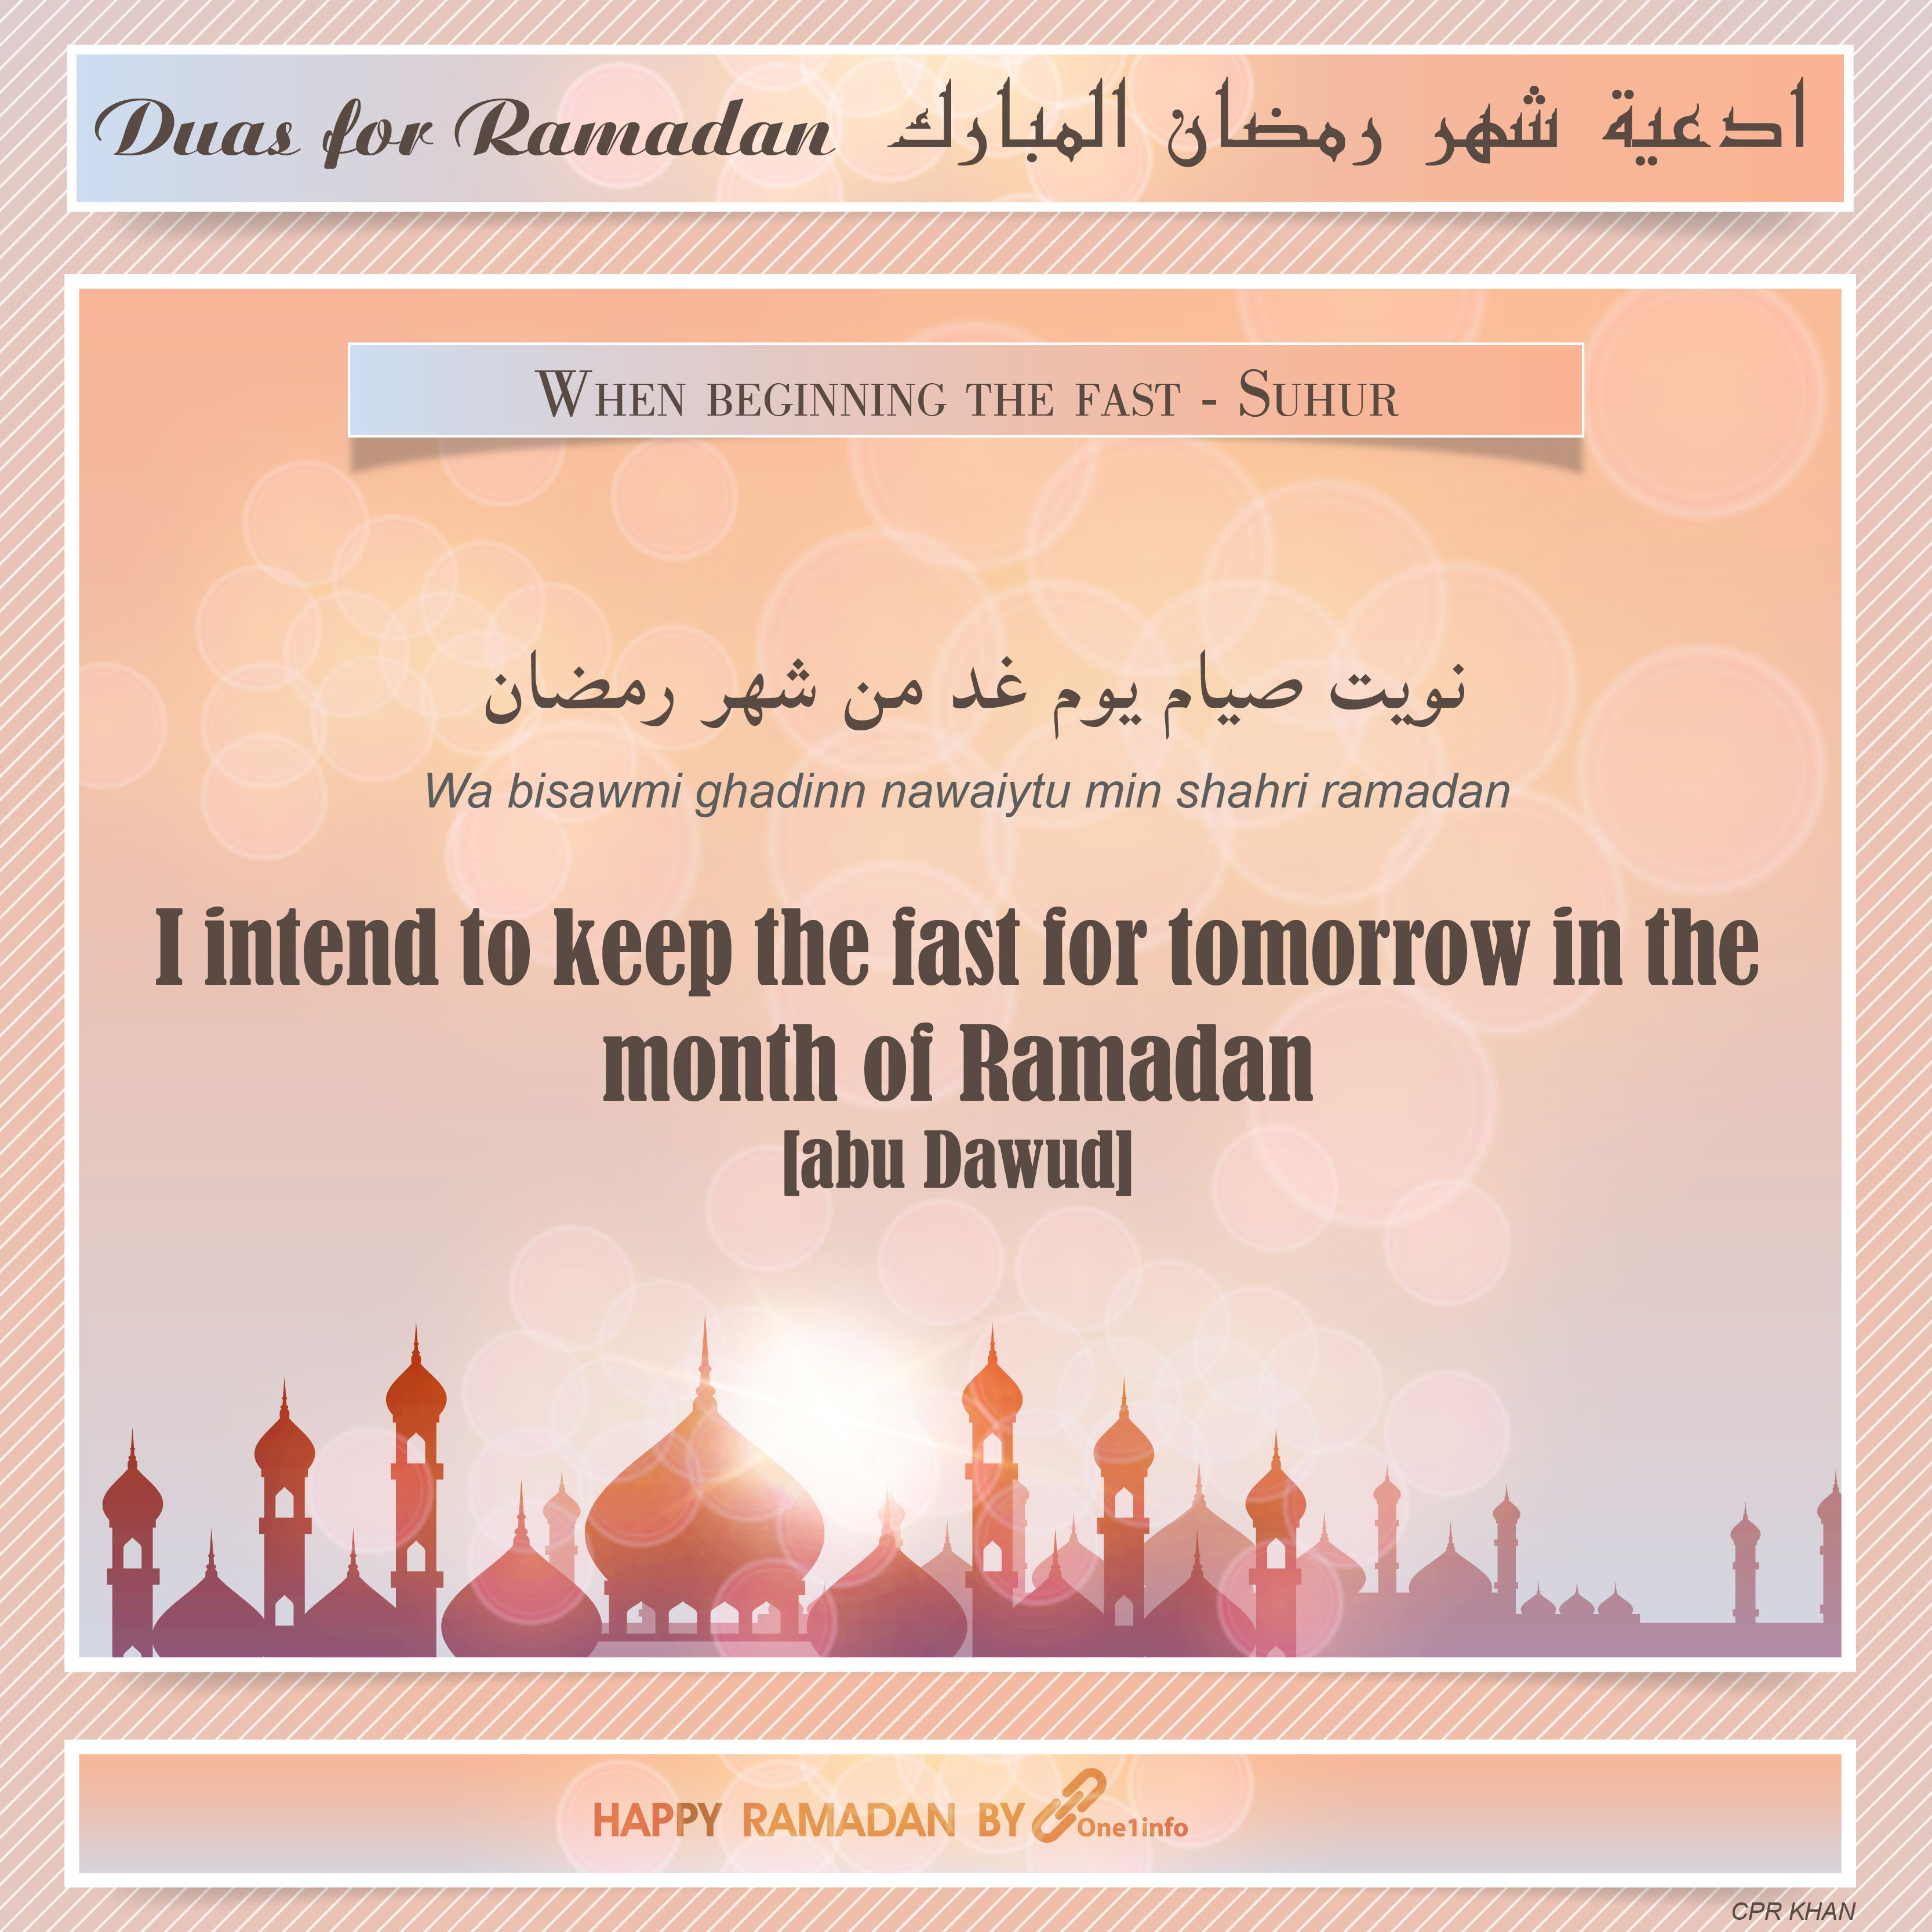 Duas For Ramadan ادعية شهر رمضان المبارك When Beginning The Fast Suhur نويت صيام يوم غد من شهر رمضان I Intend To Keep The Ramadan Ramadan Kareem Happy